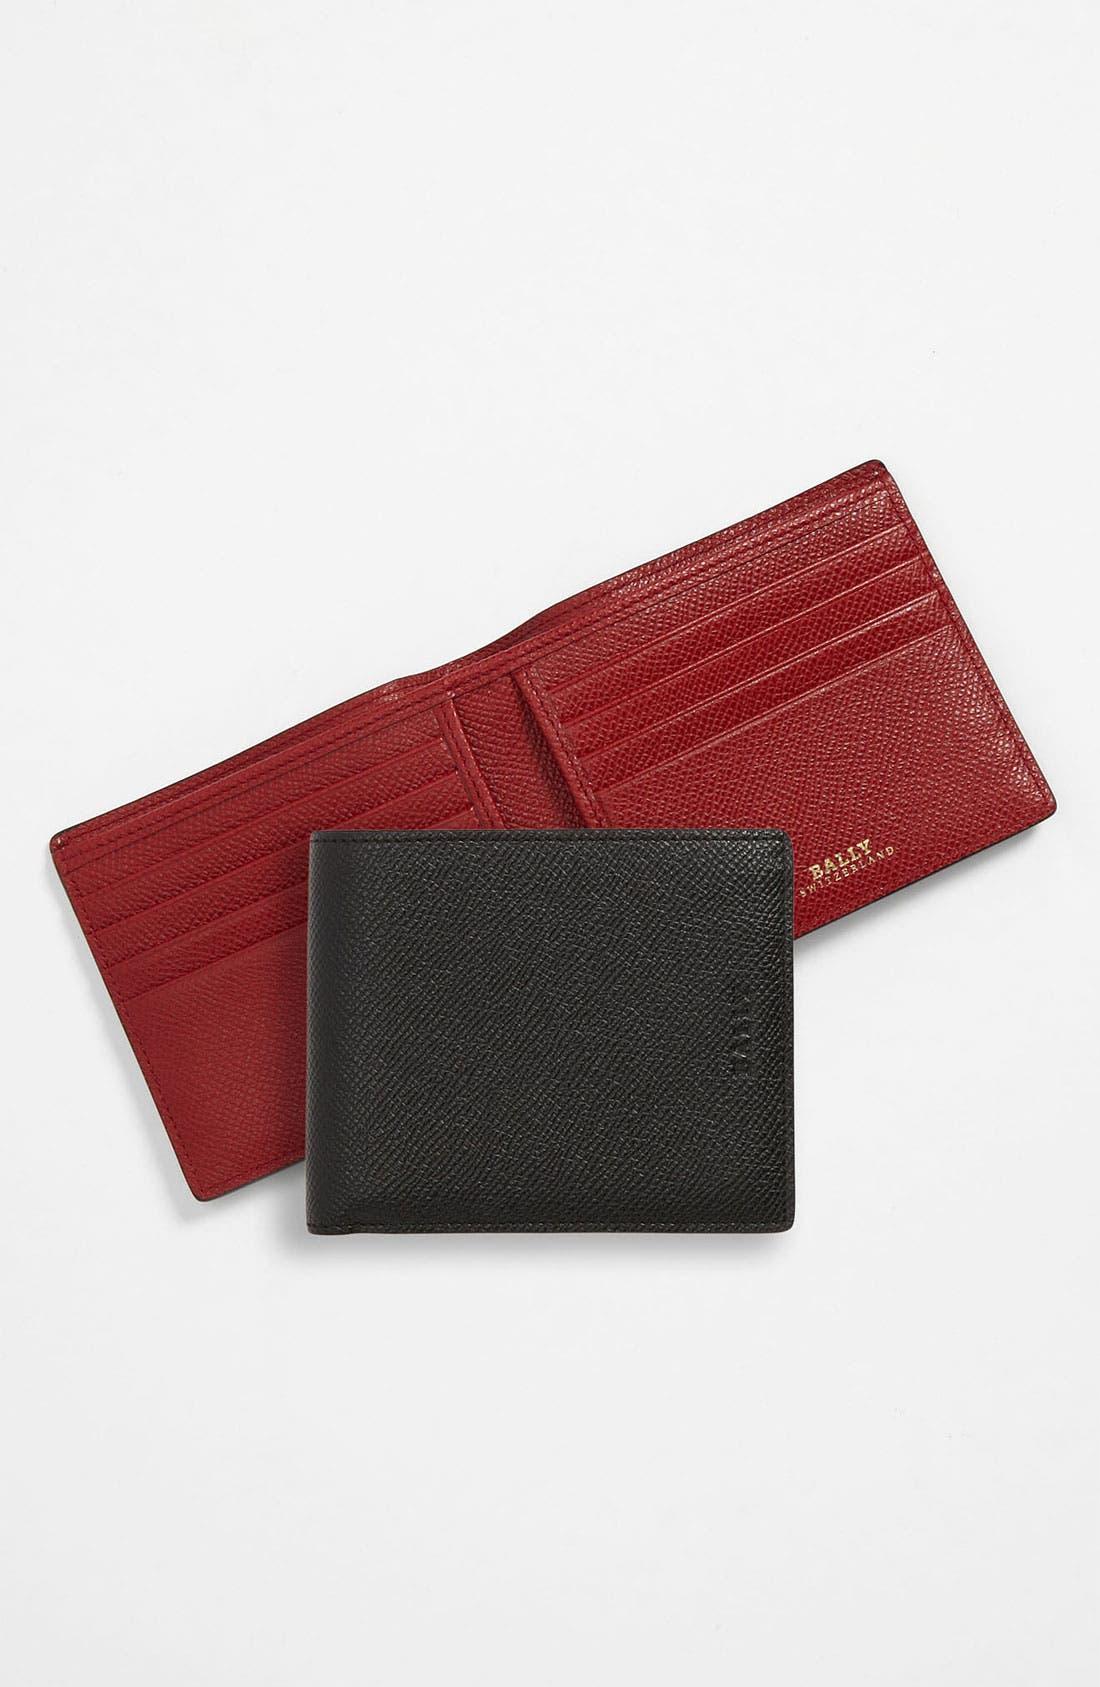 Main Image - Bally Calfskin Wallet